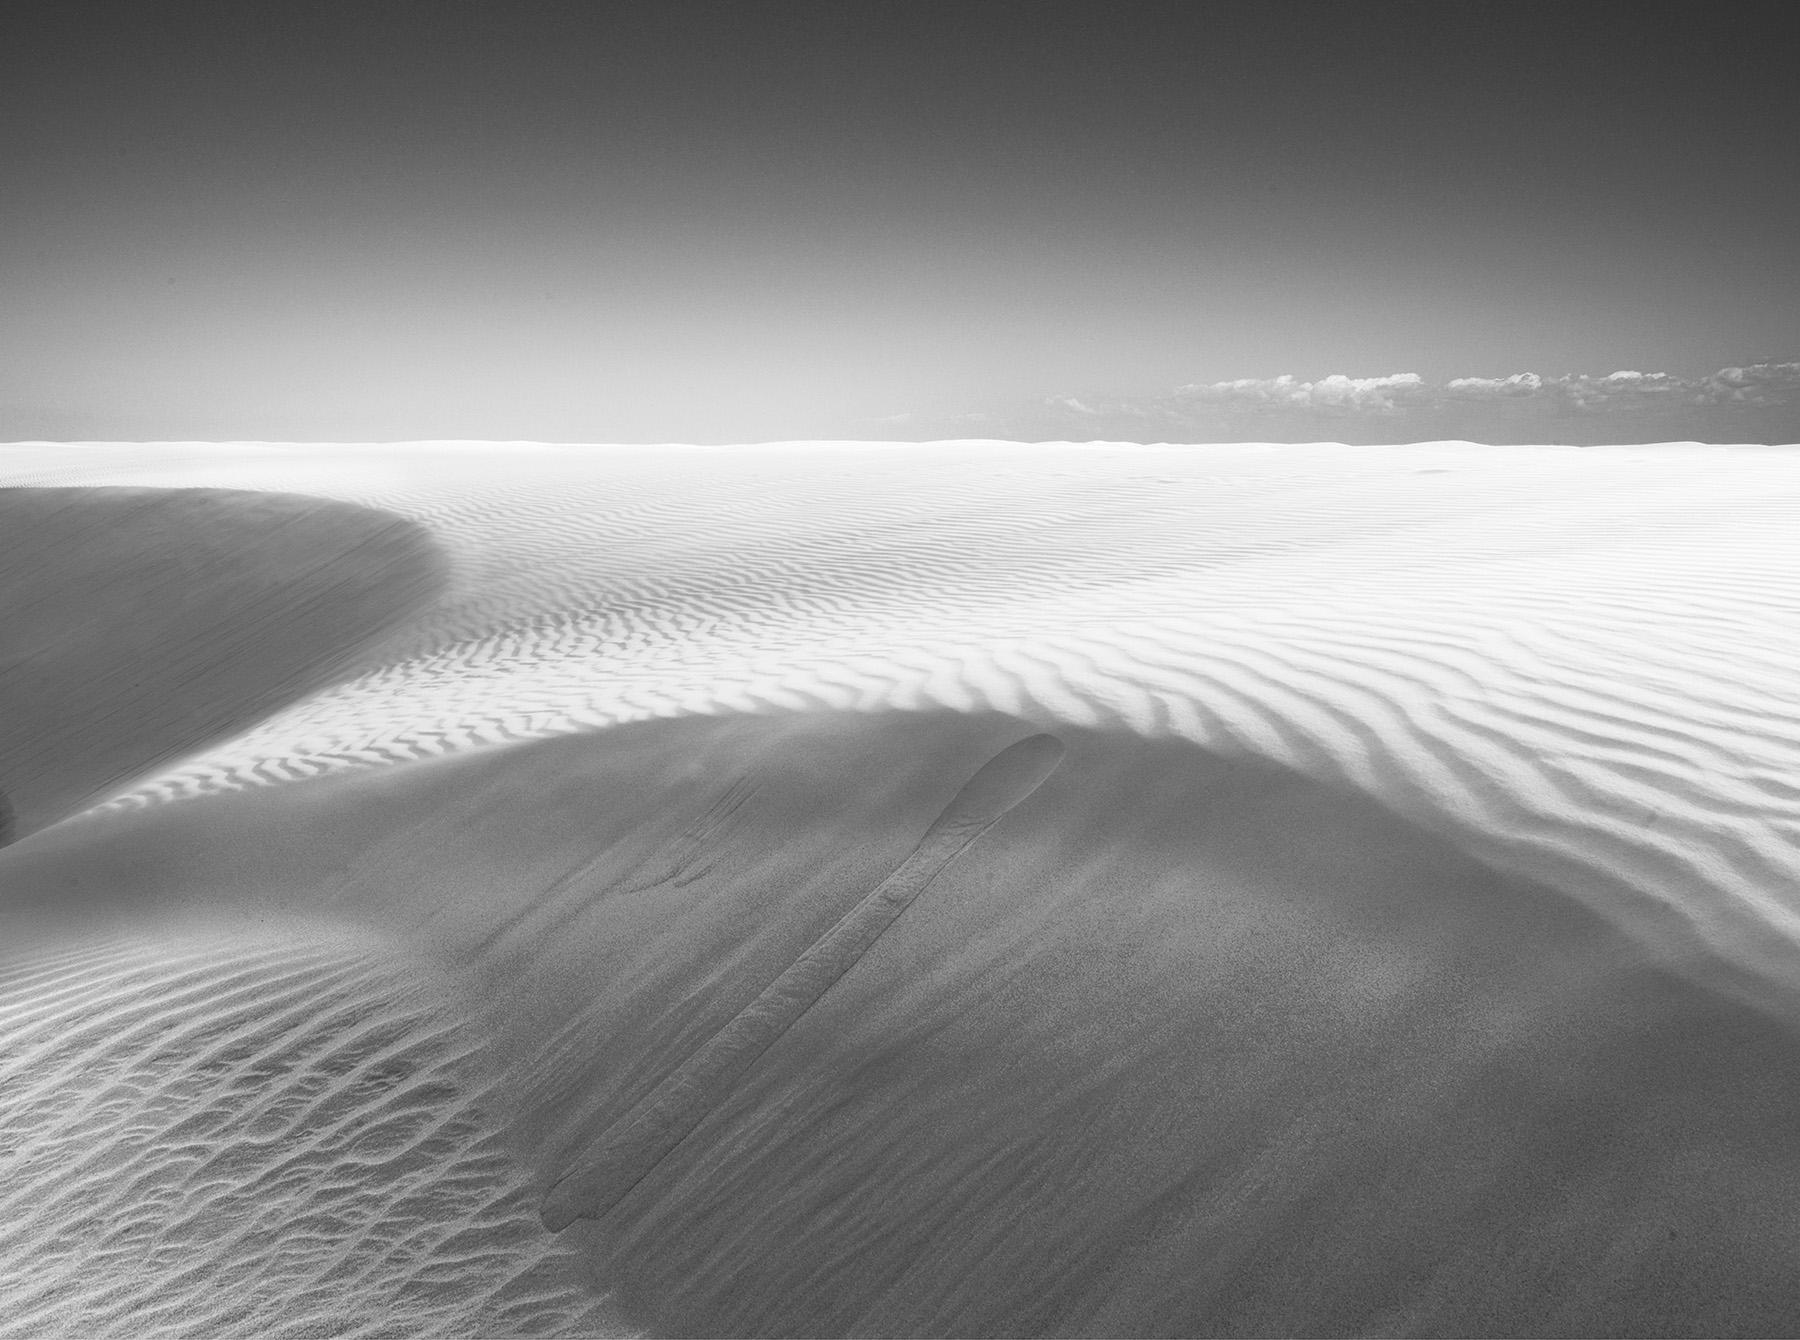 Dune-1.jpg